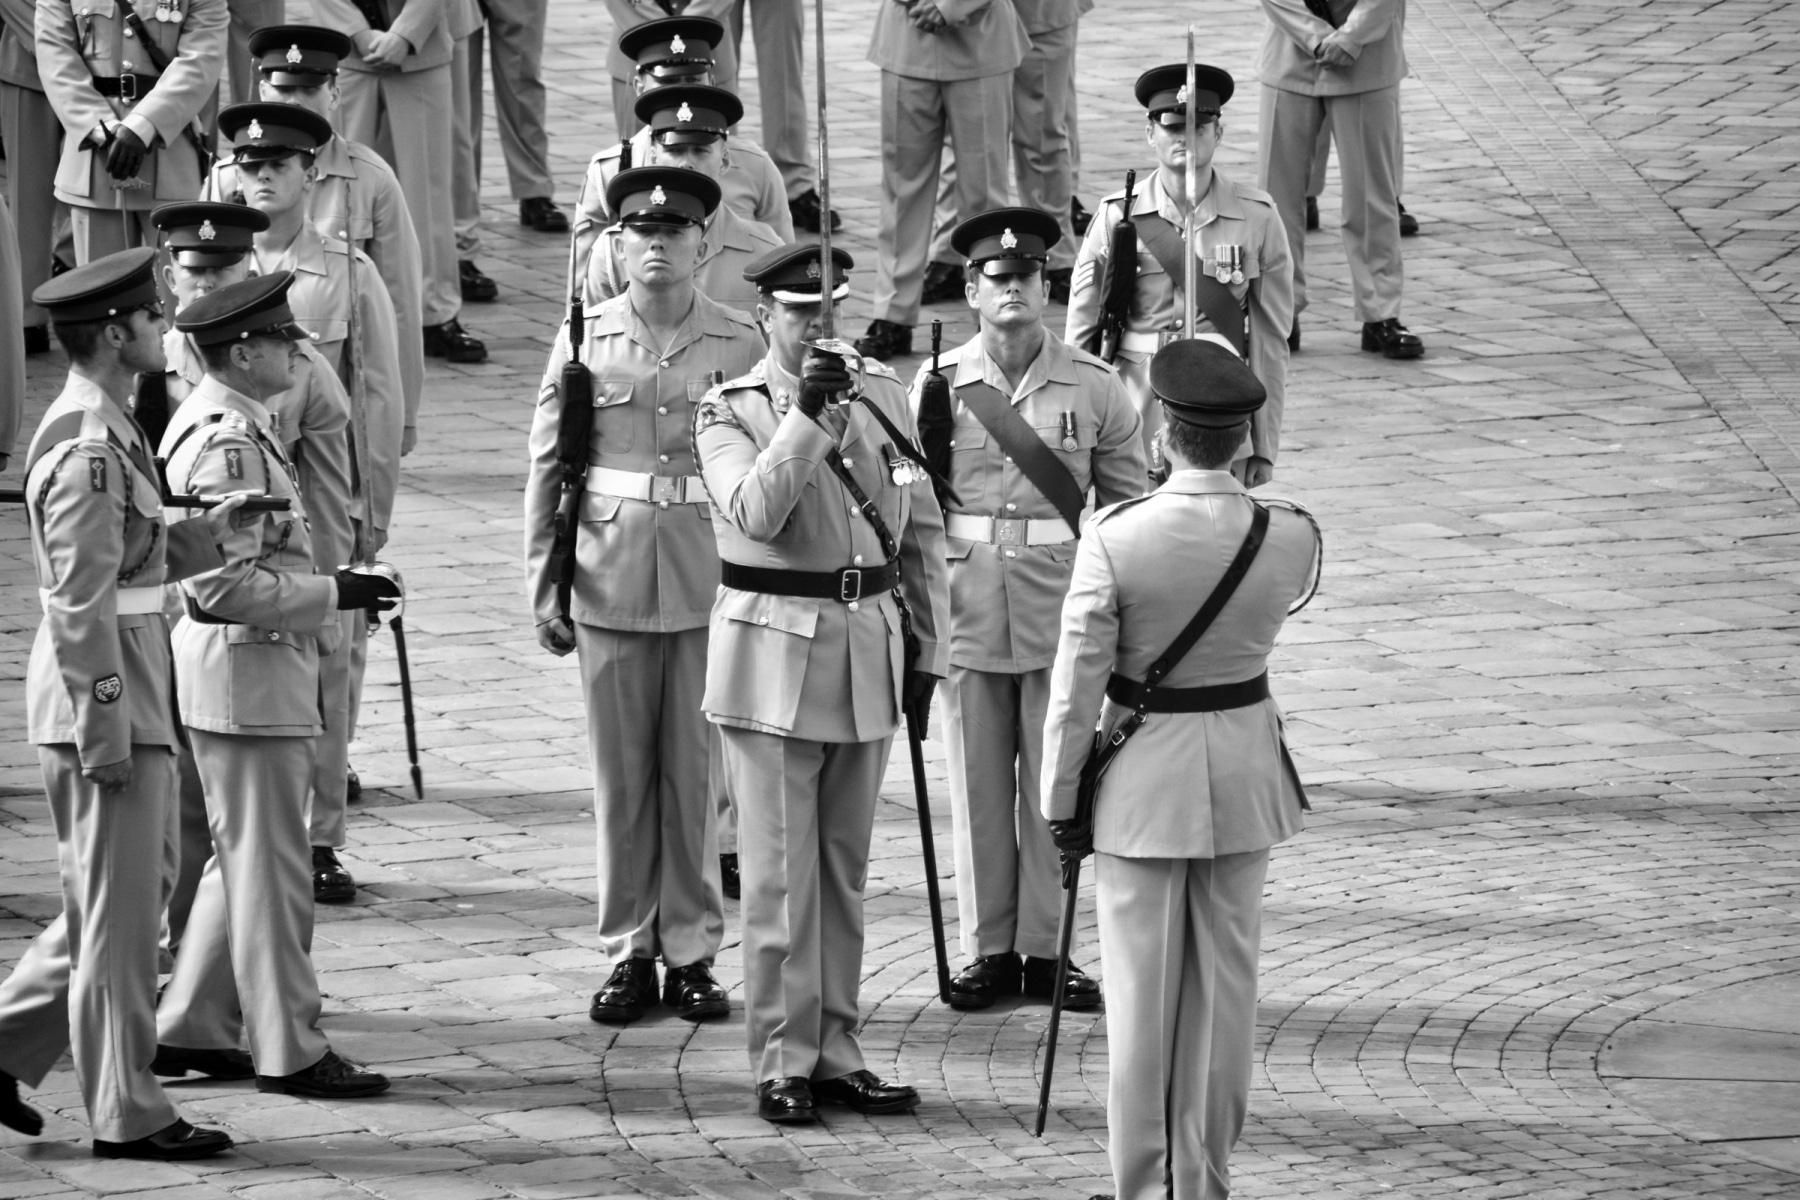 regiment-freedom-of-city-0240-bw_15253257470_o